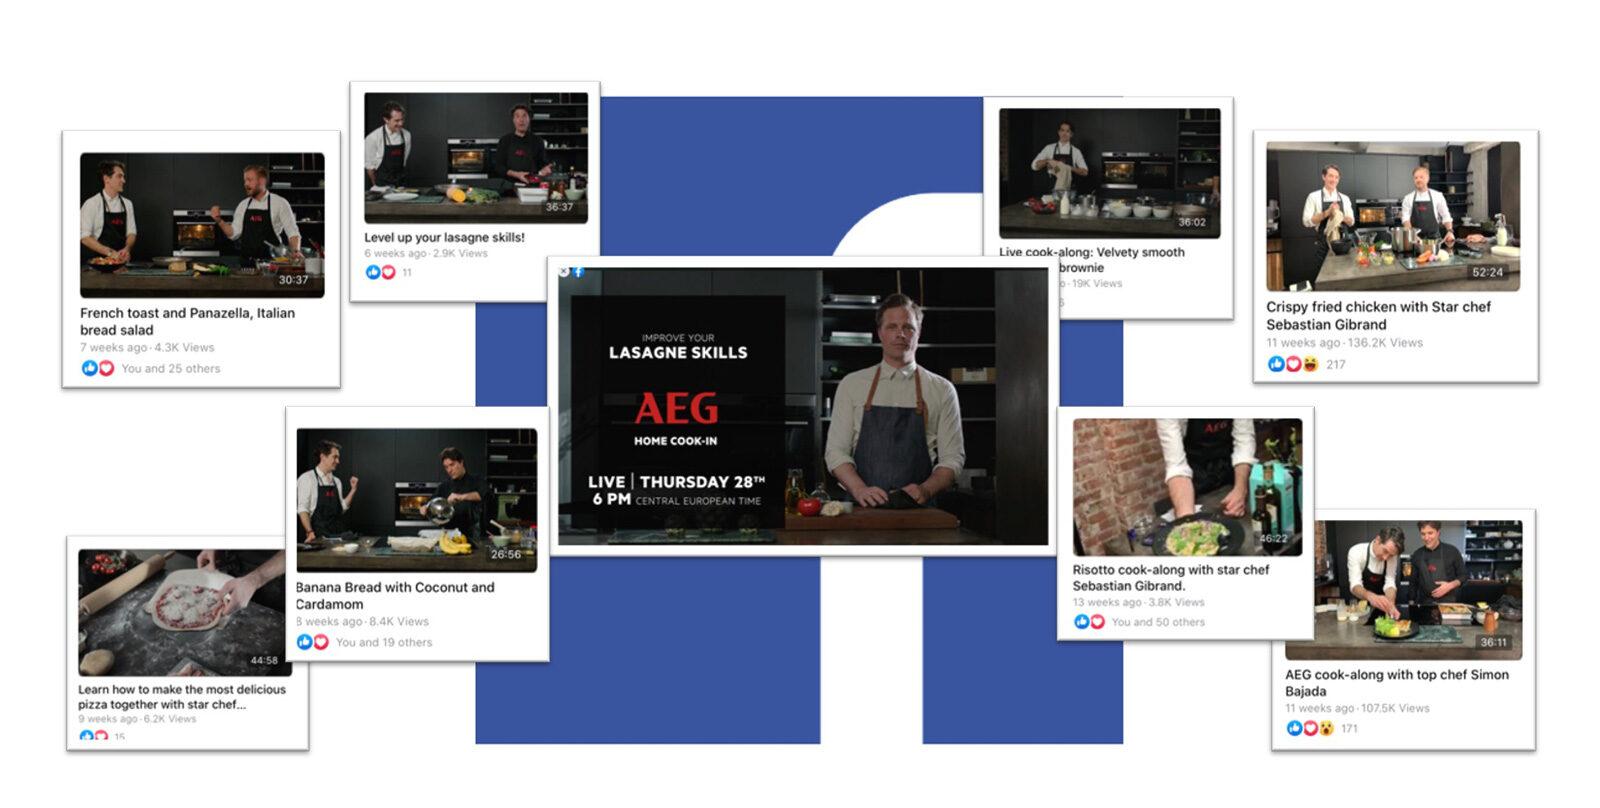 AEG: Home Cook-IN facebook